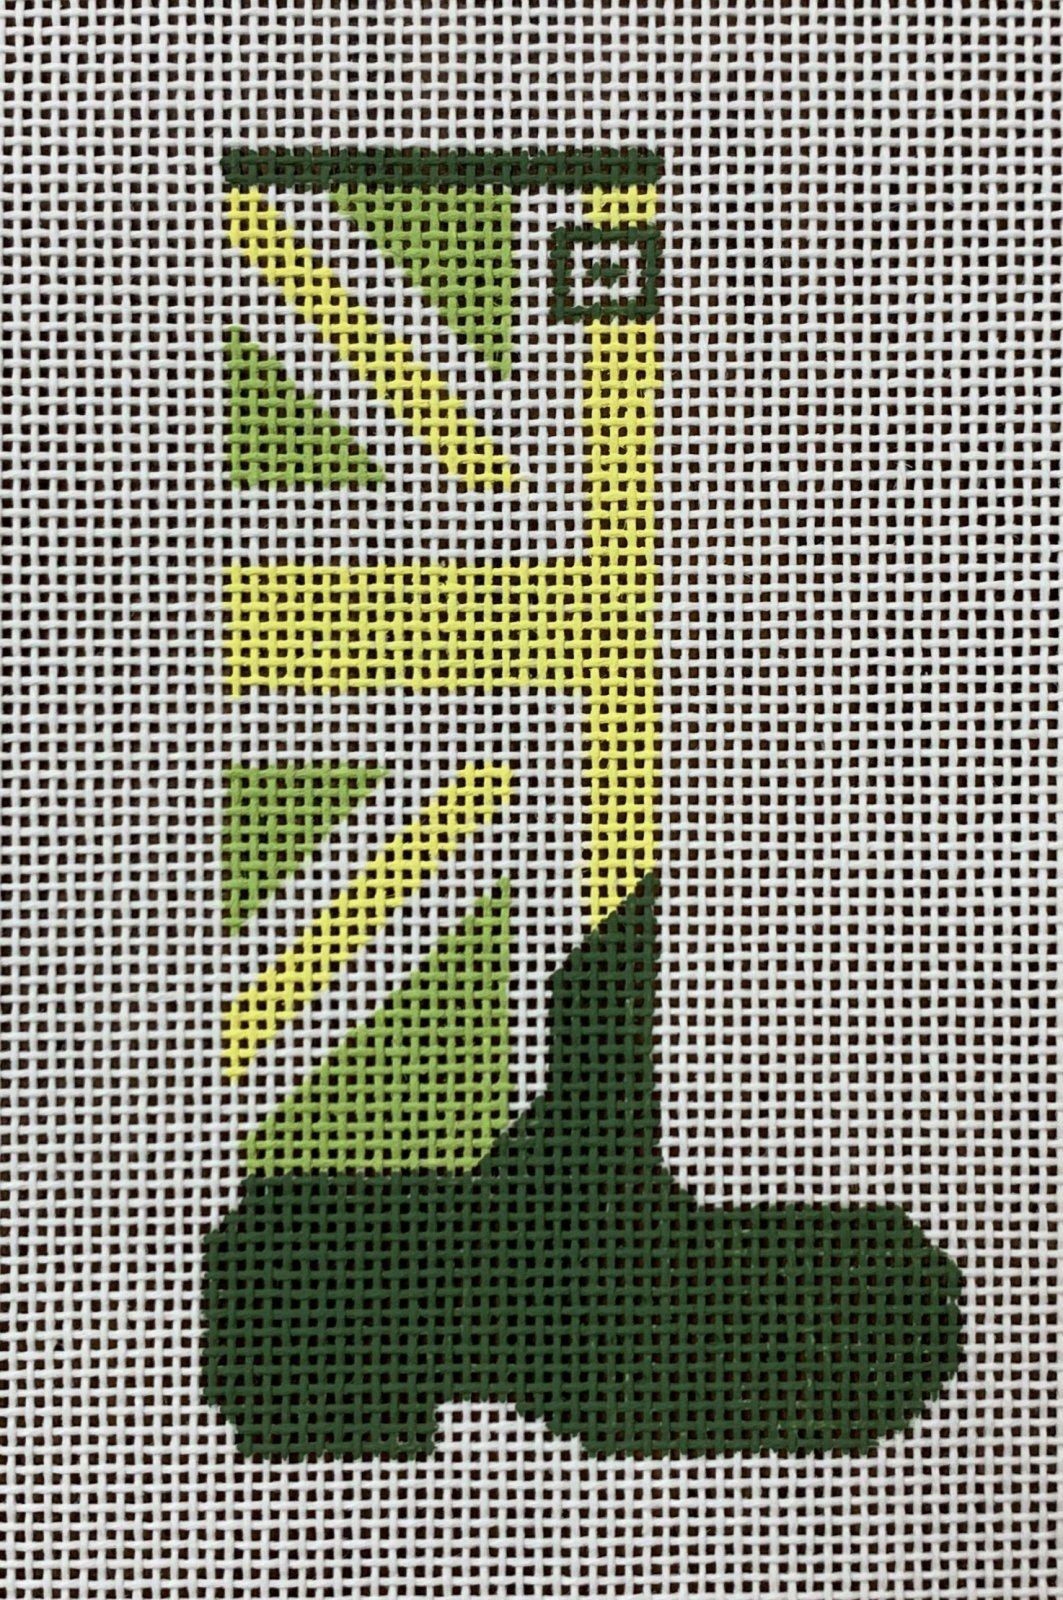 Wellie Union Jack (custard, watercress, green)